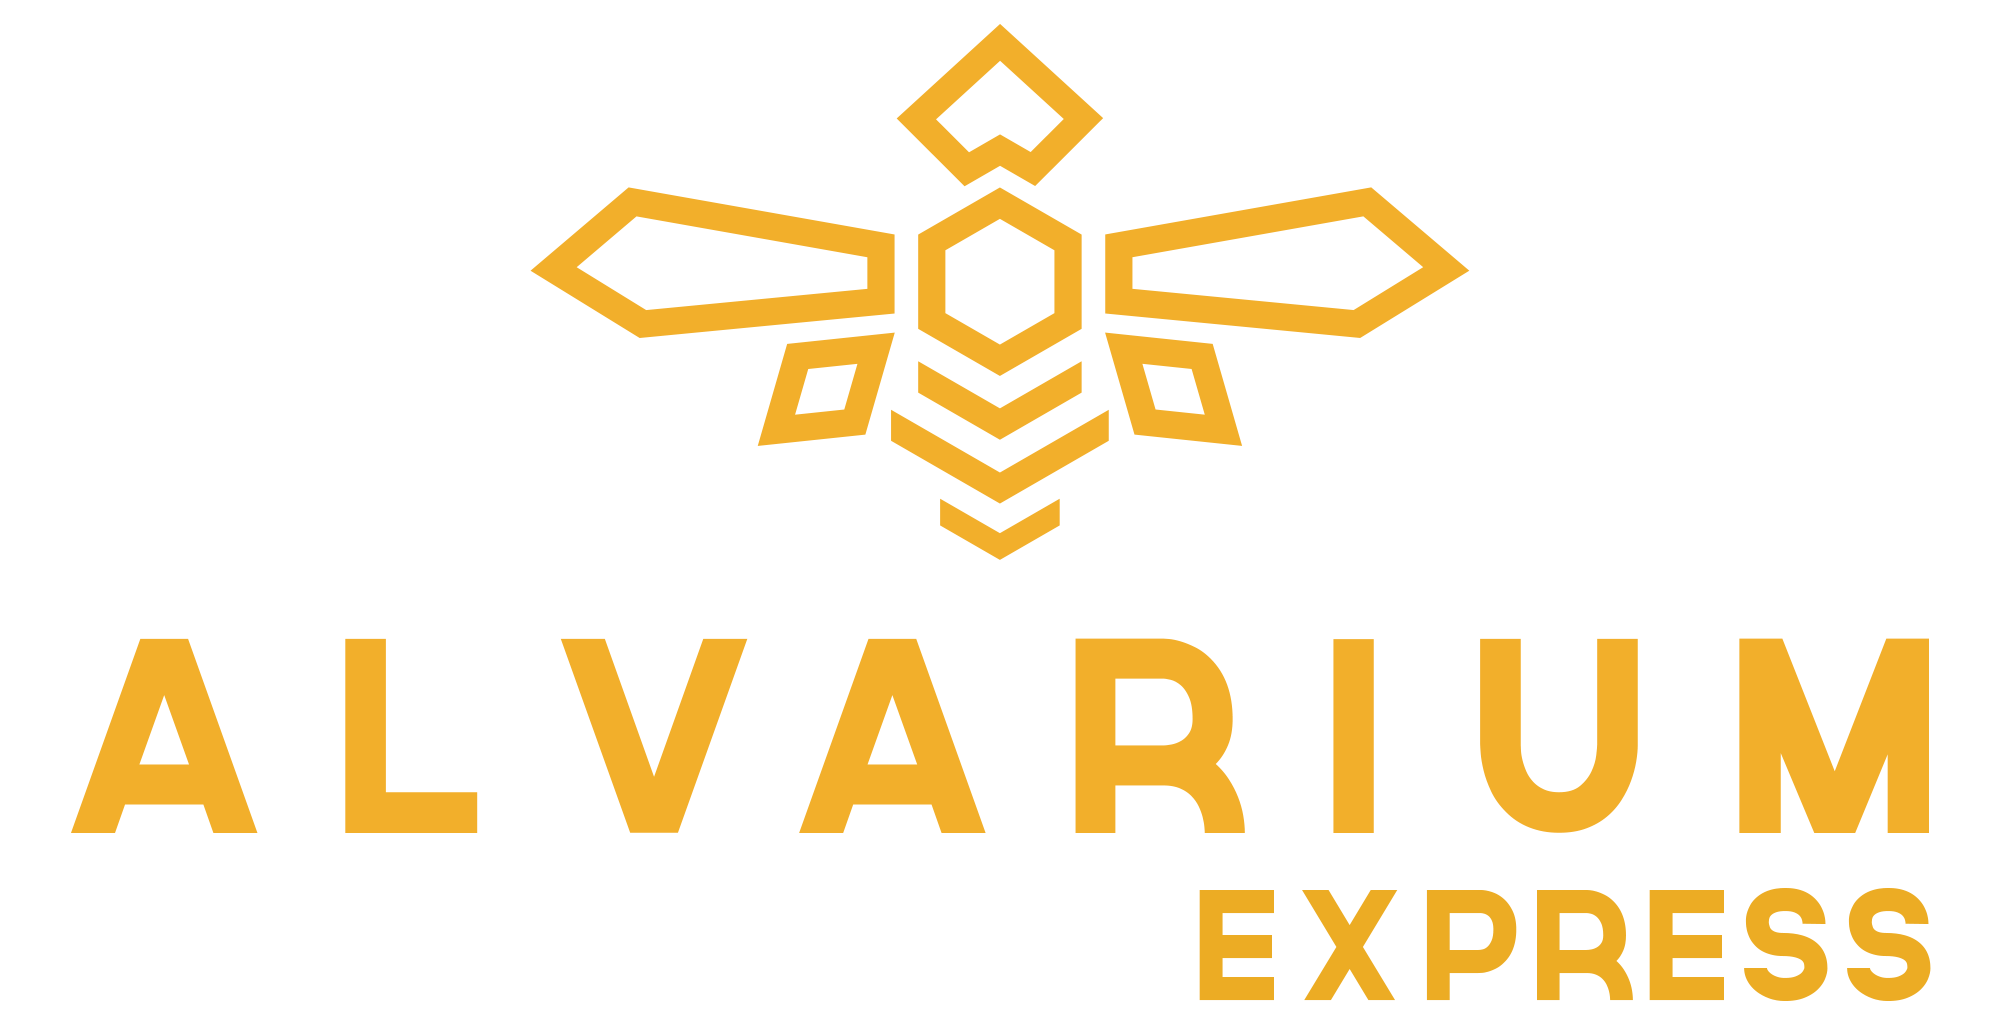 alvarium_express_logo.png